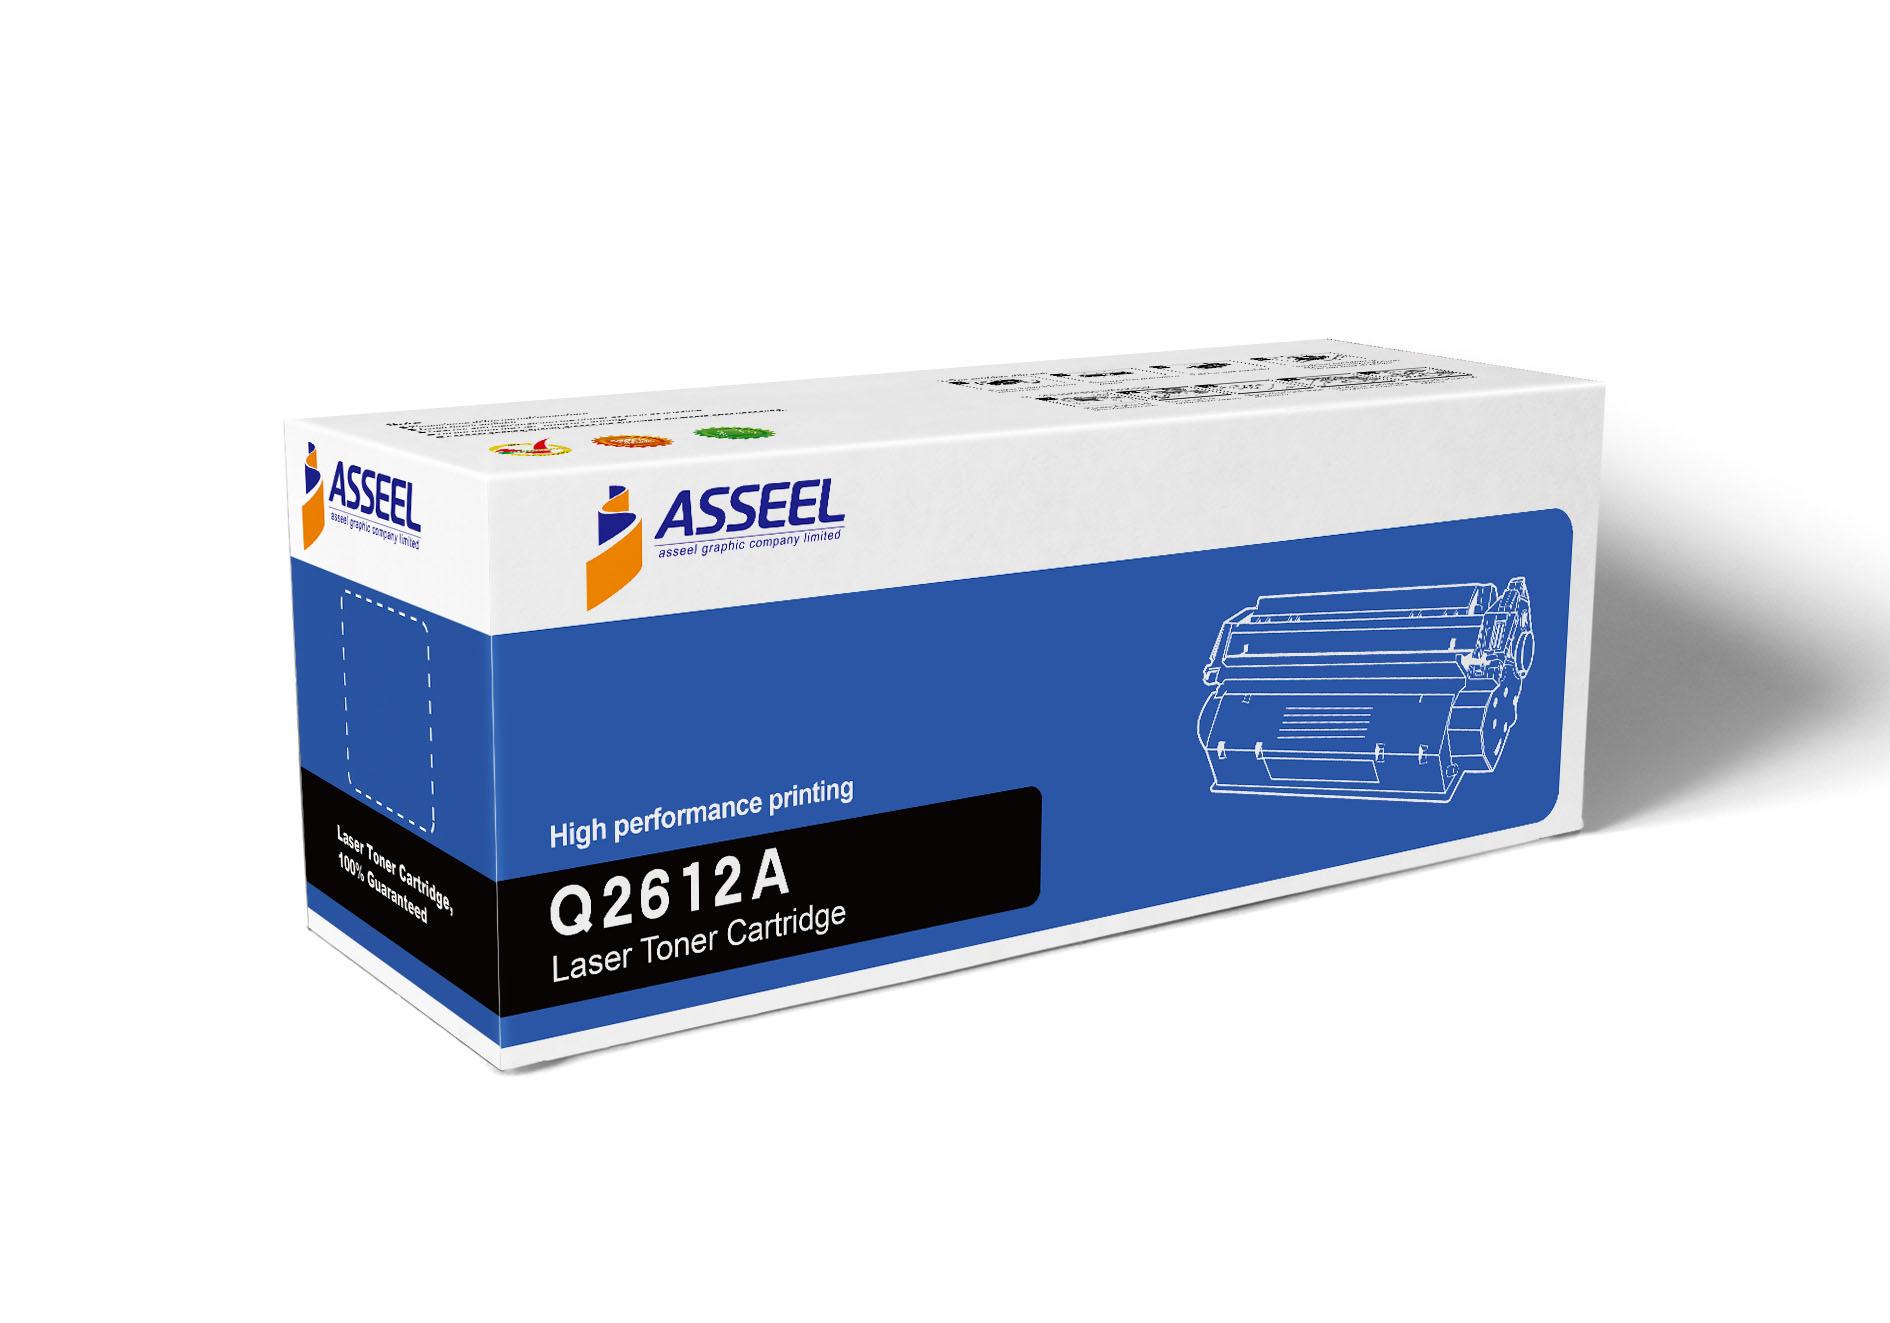 Asseel toner cartridge box (7)